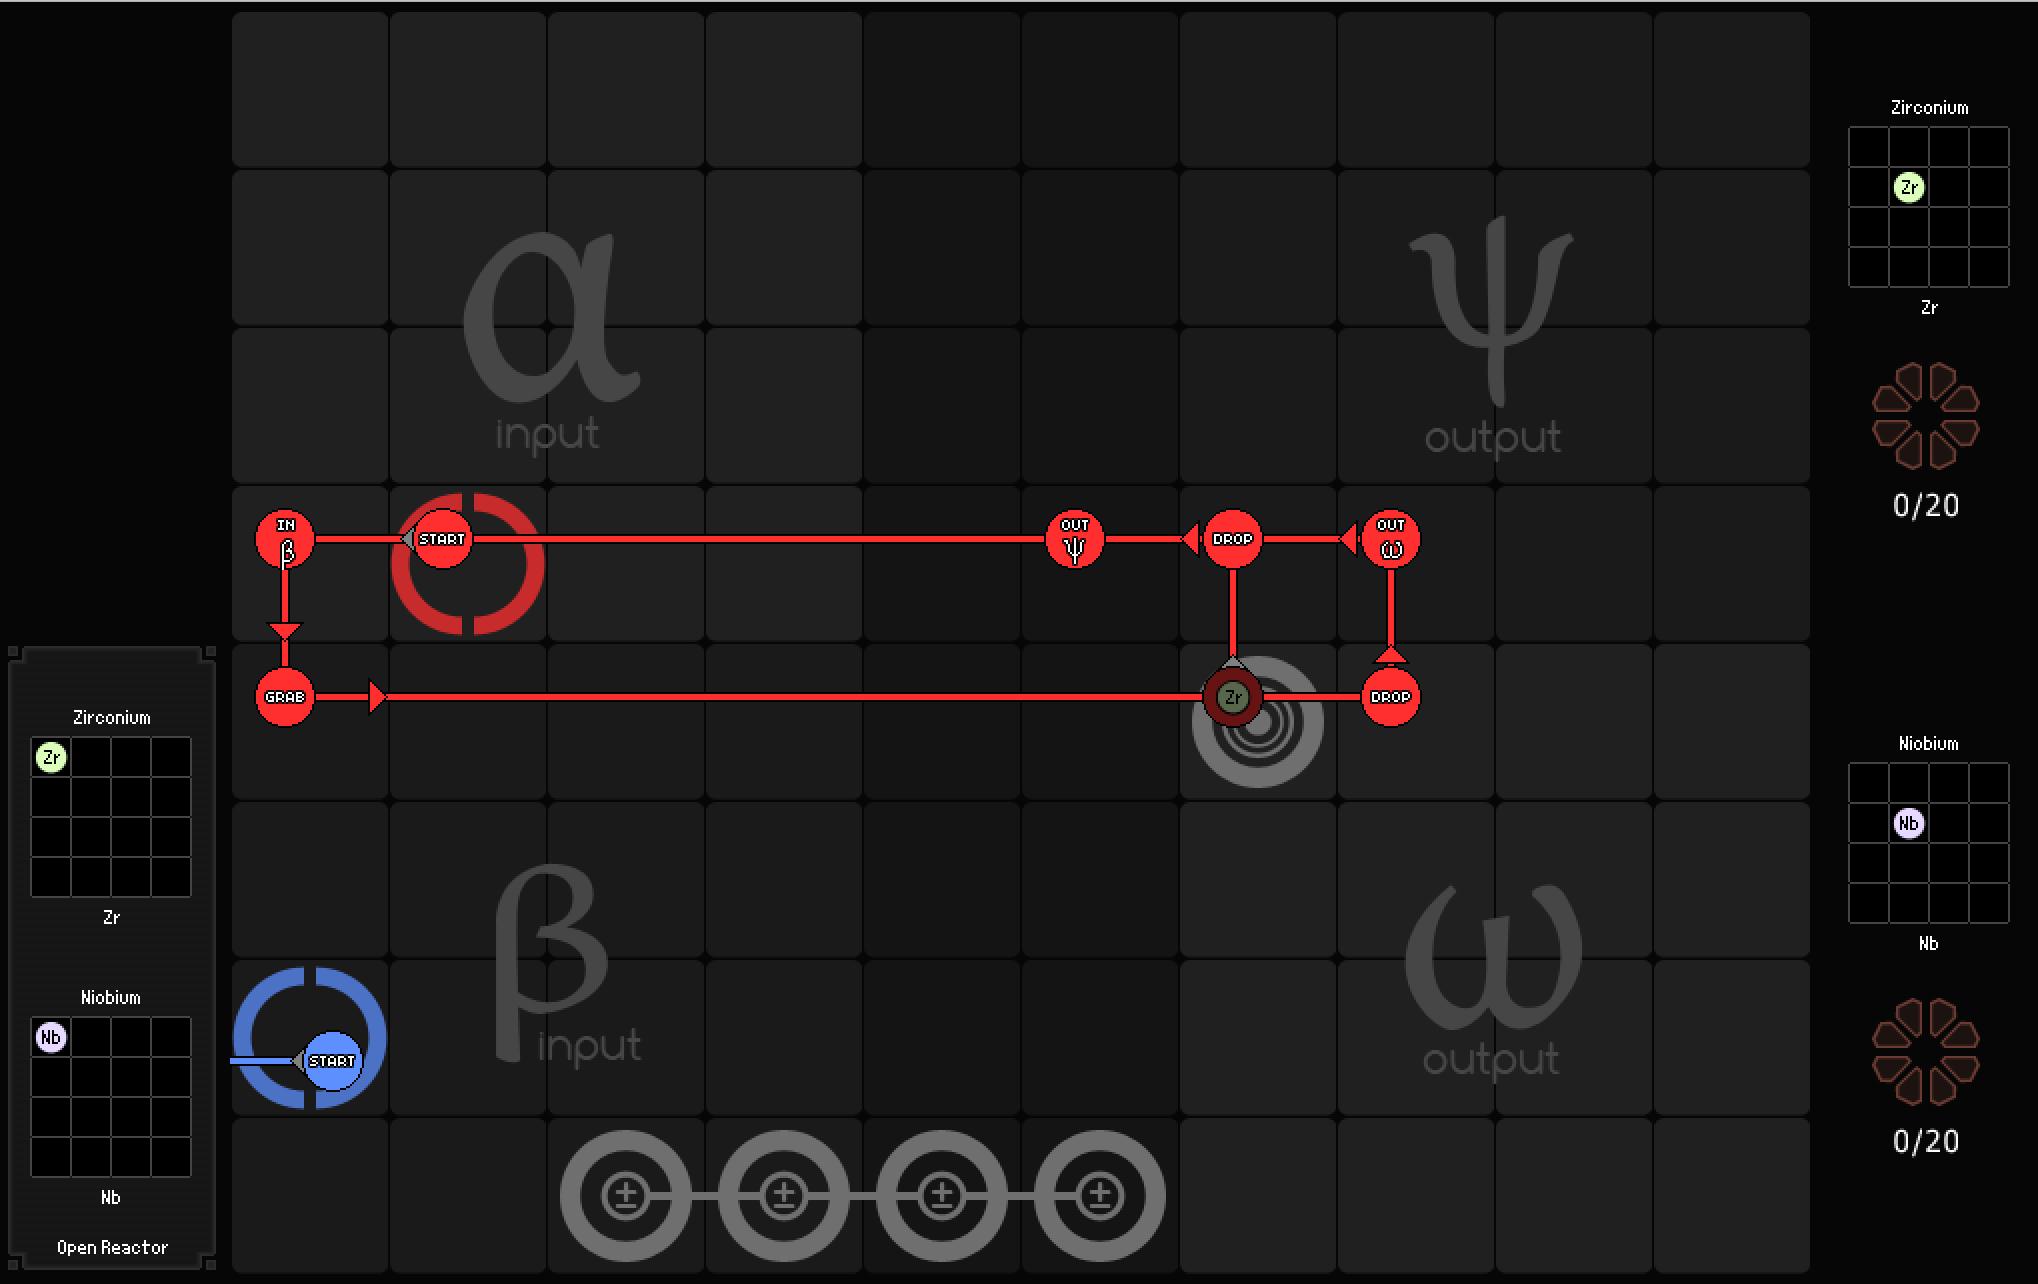 1_Story_Mode/5_Sikutar/SpaceChem-5.4.a/Reactor_3.png